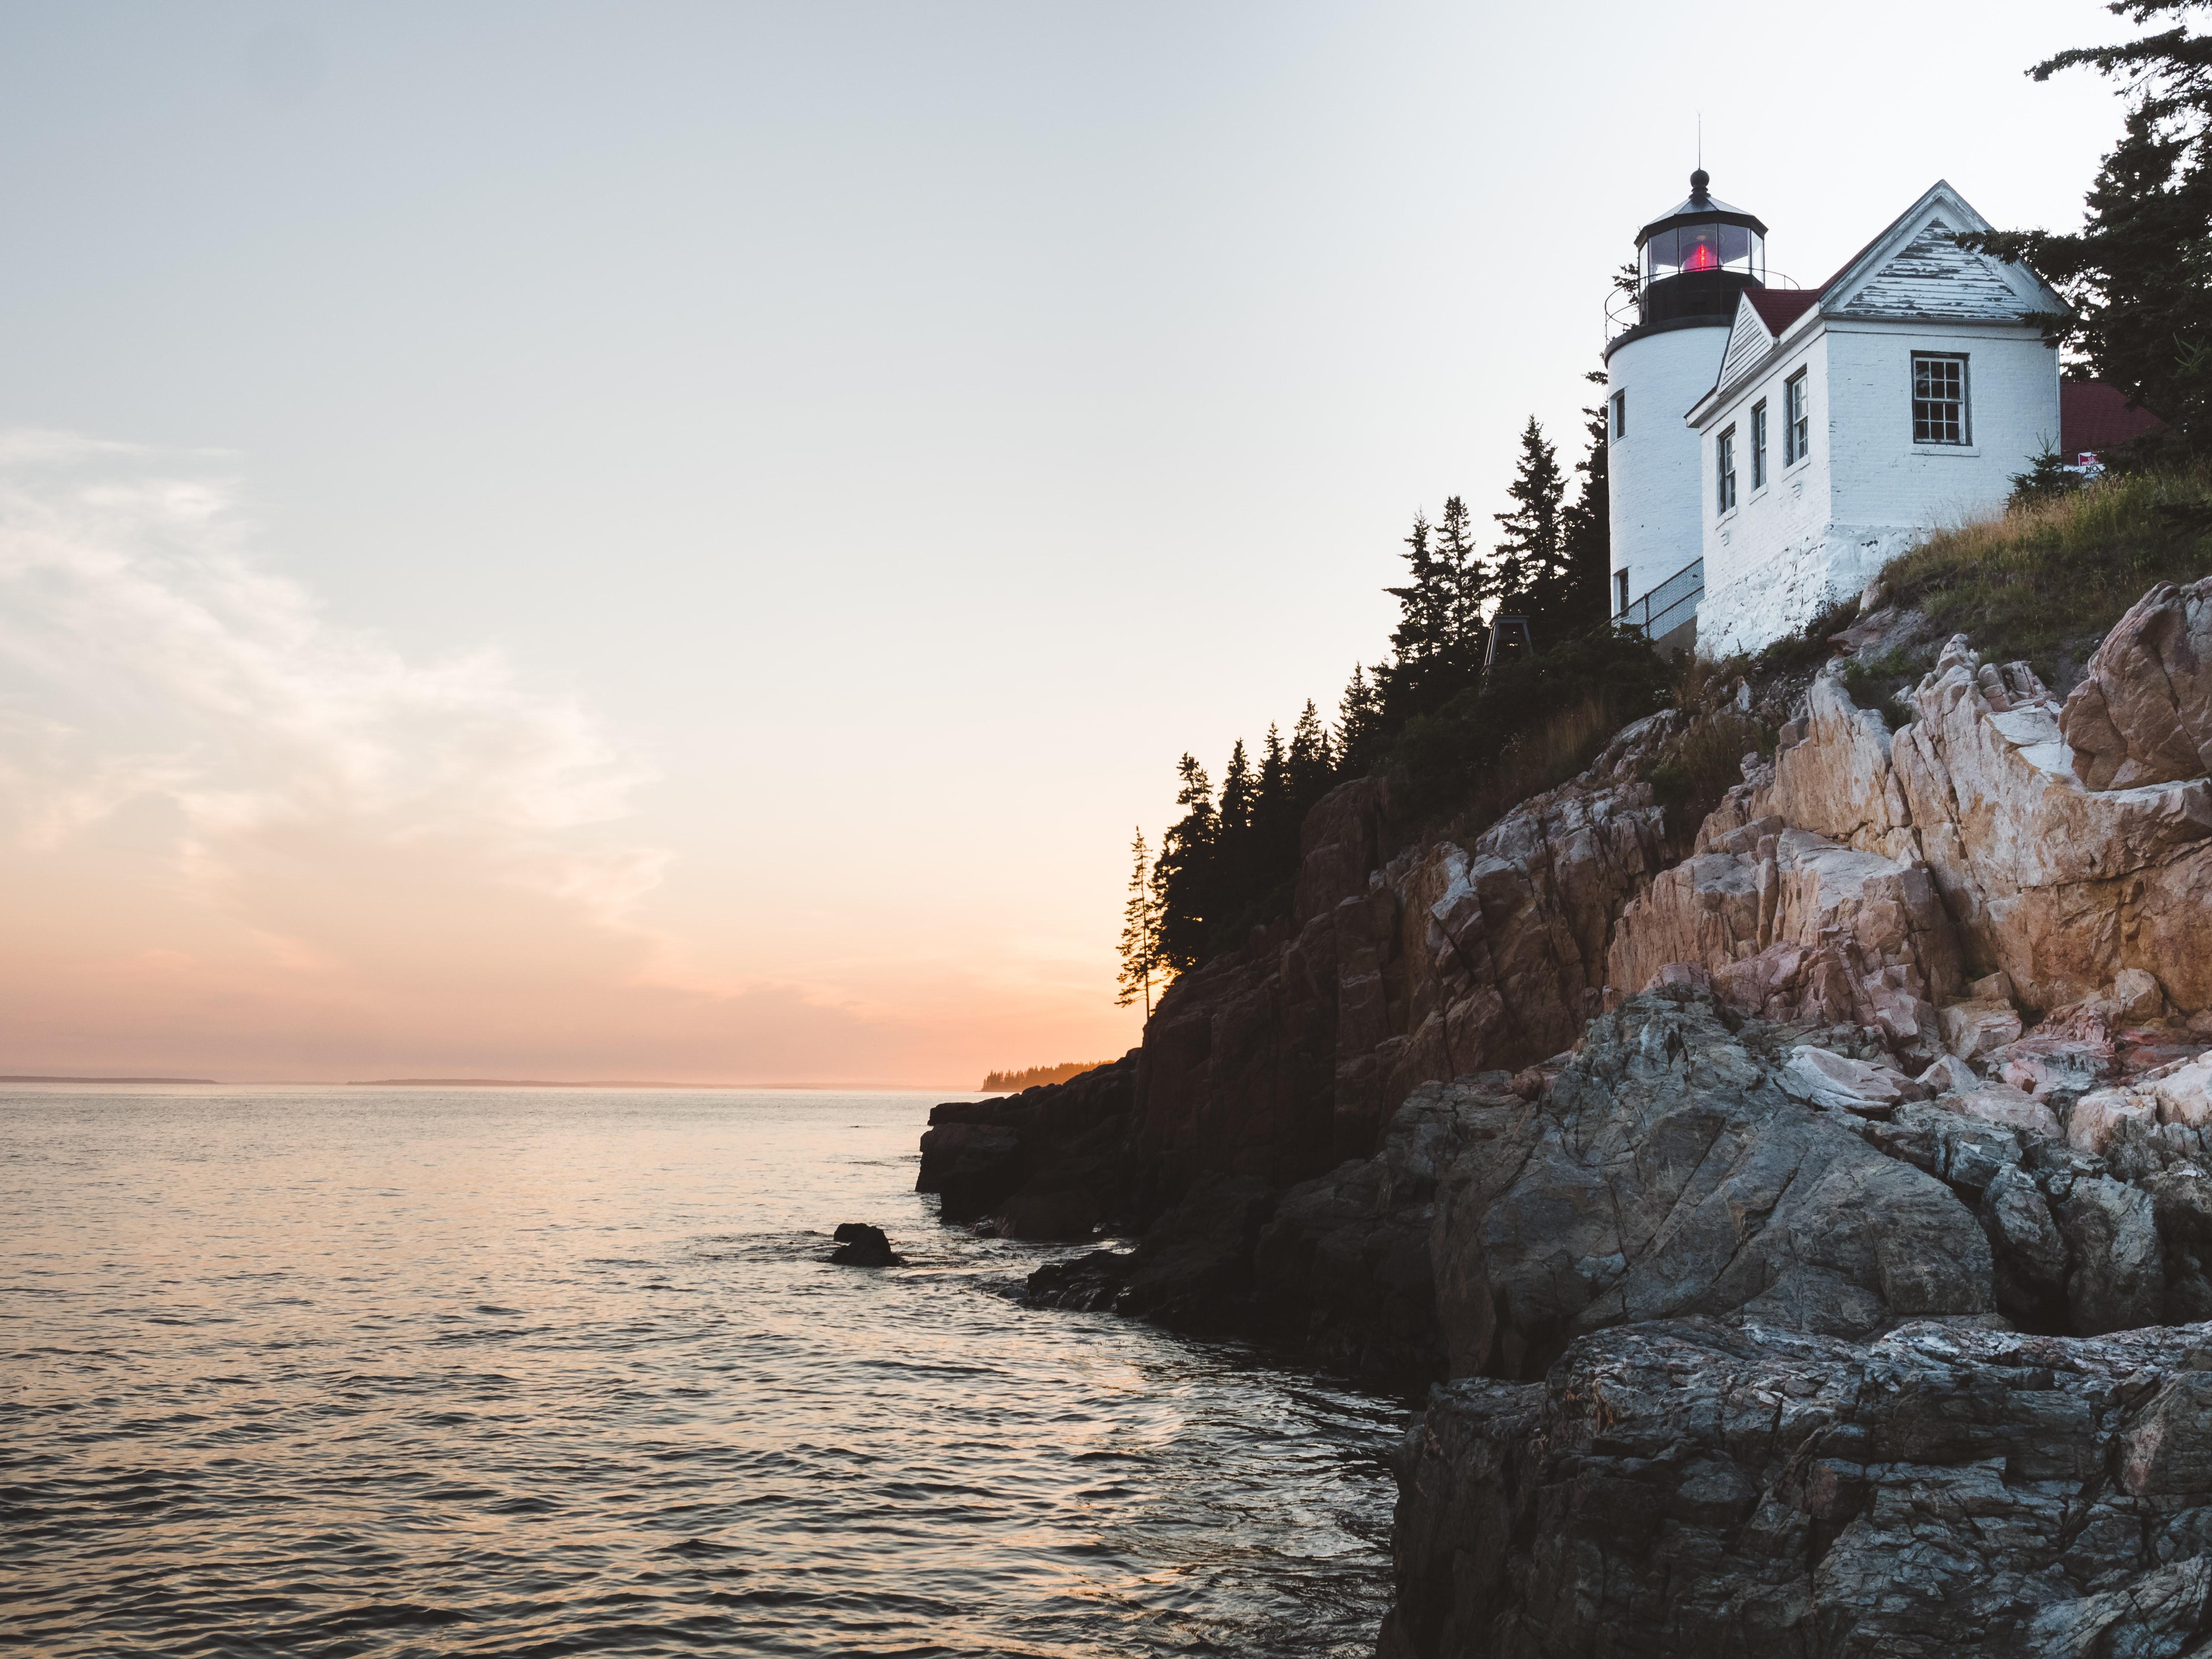 Bass Harbor Head Lighthouse, Bass Harbor, Tremont, Maine